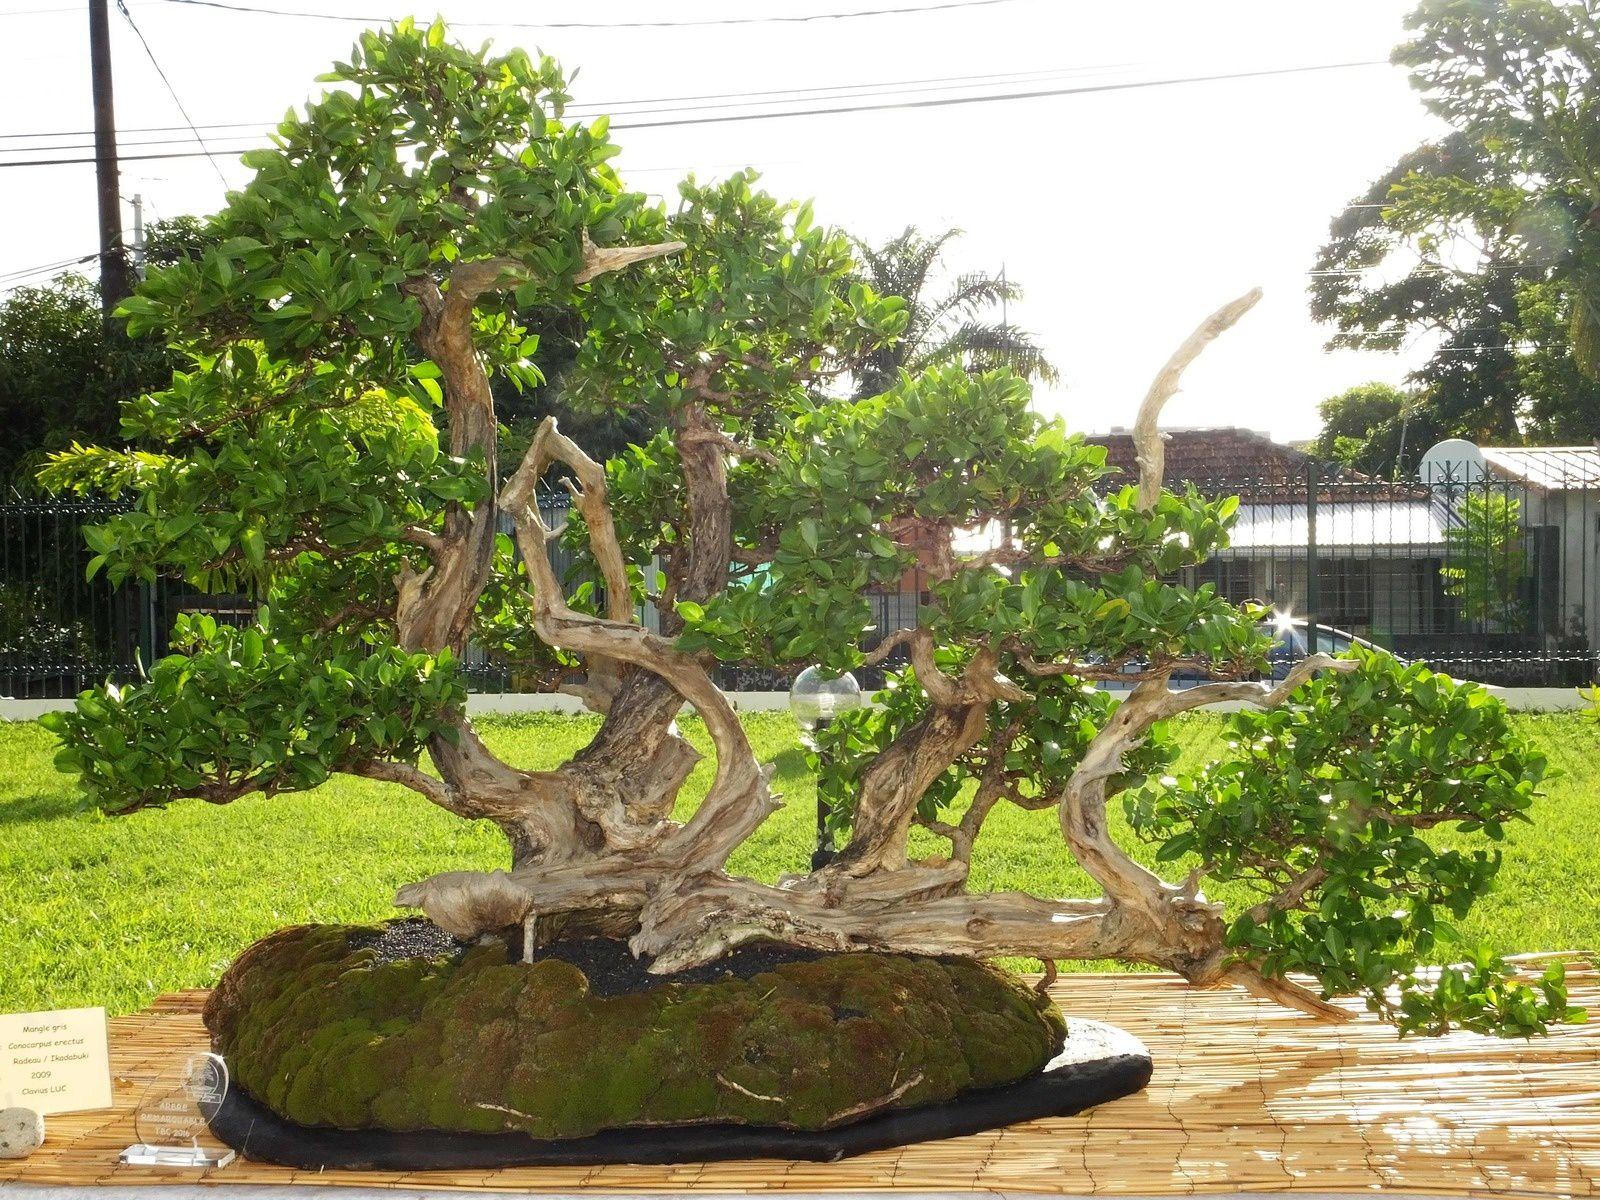 Arbre remarquable TBC 2016. Conocarpus erectus. Mangle gris. Radeau